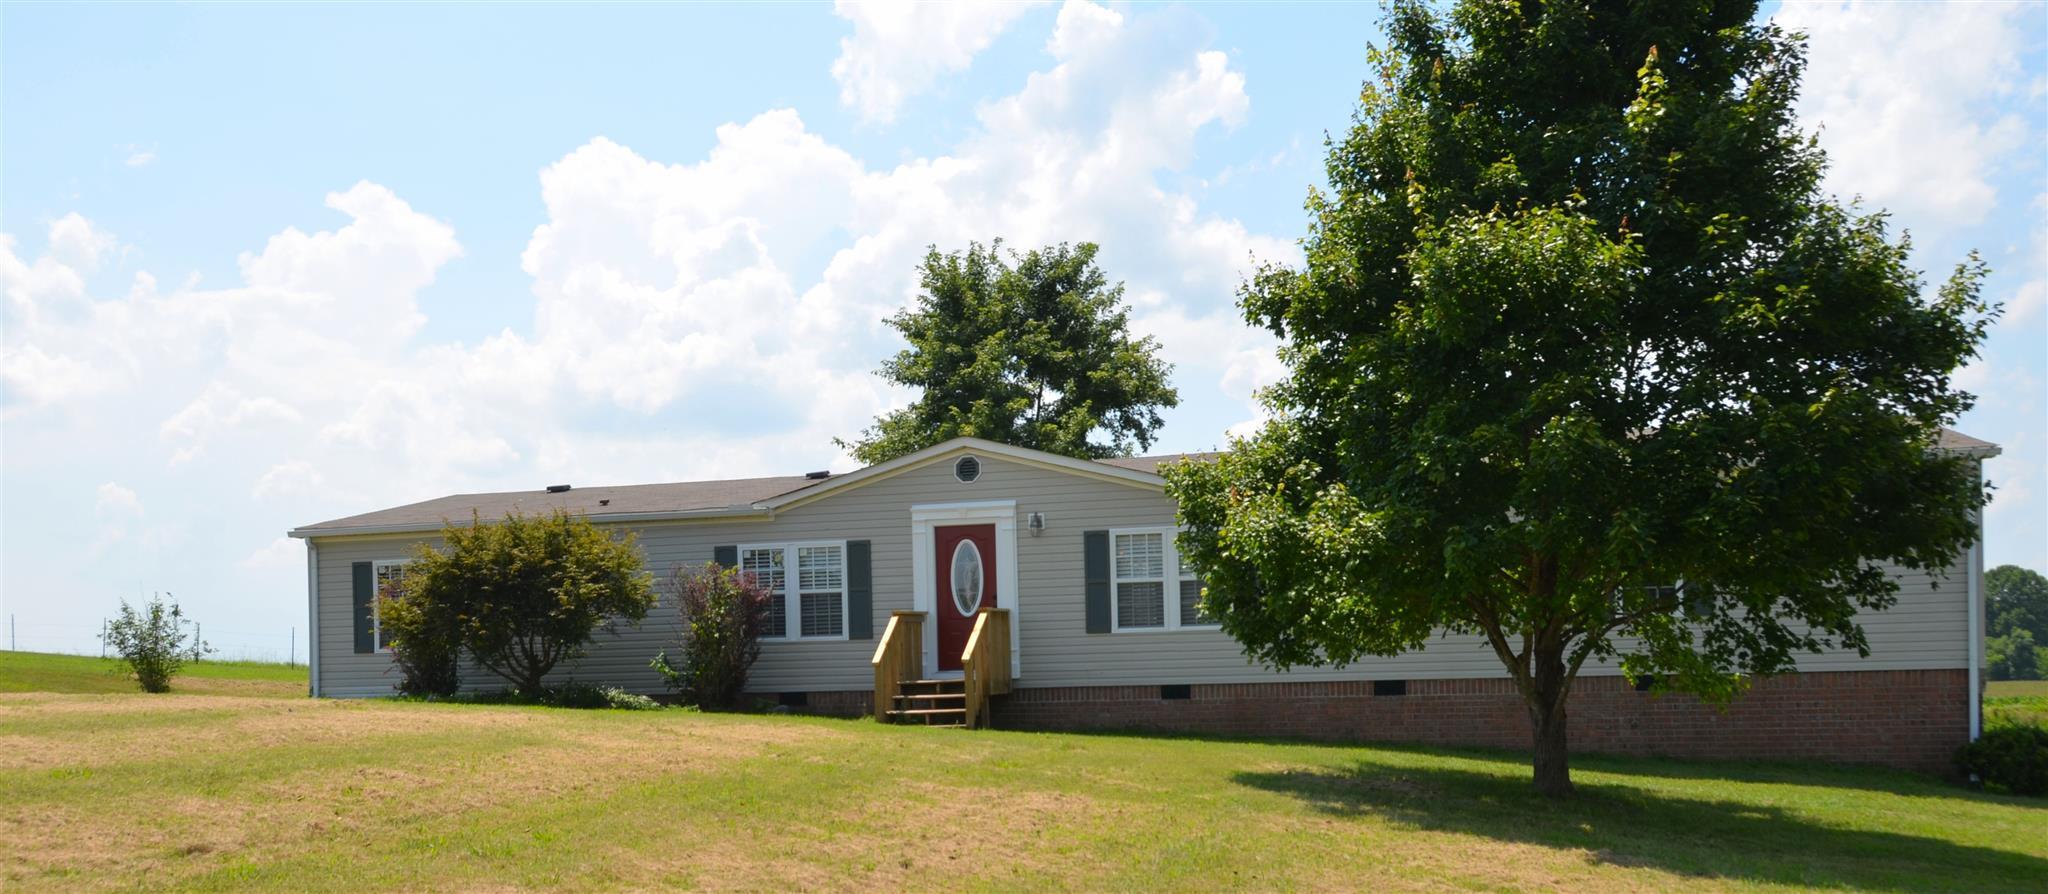 1011 Rock Springs Rd, Bethpage, TN 37022